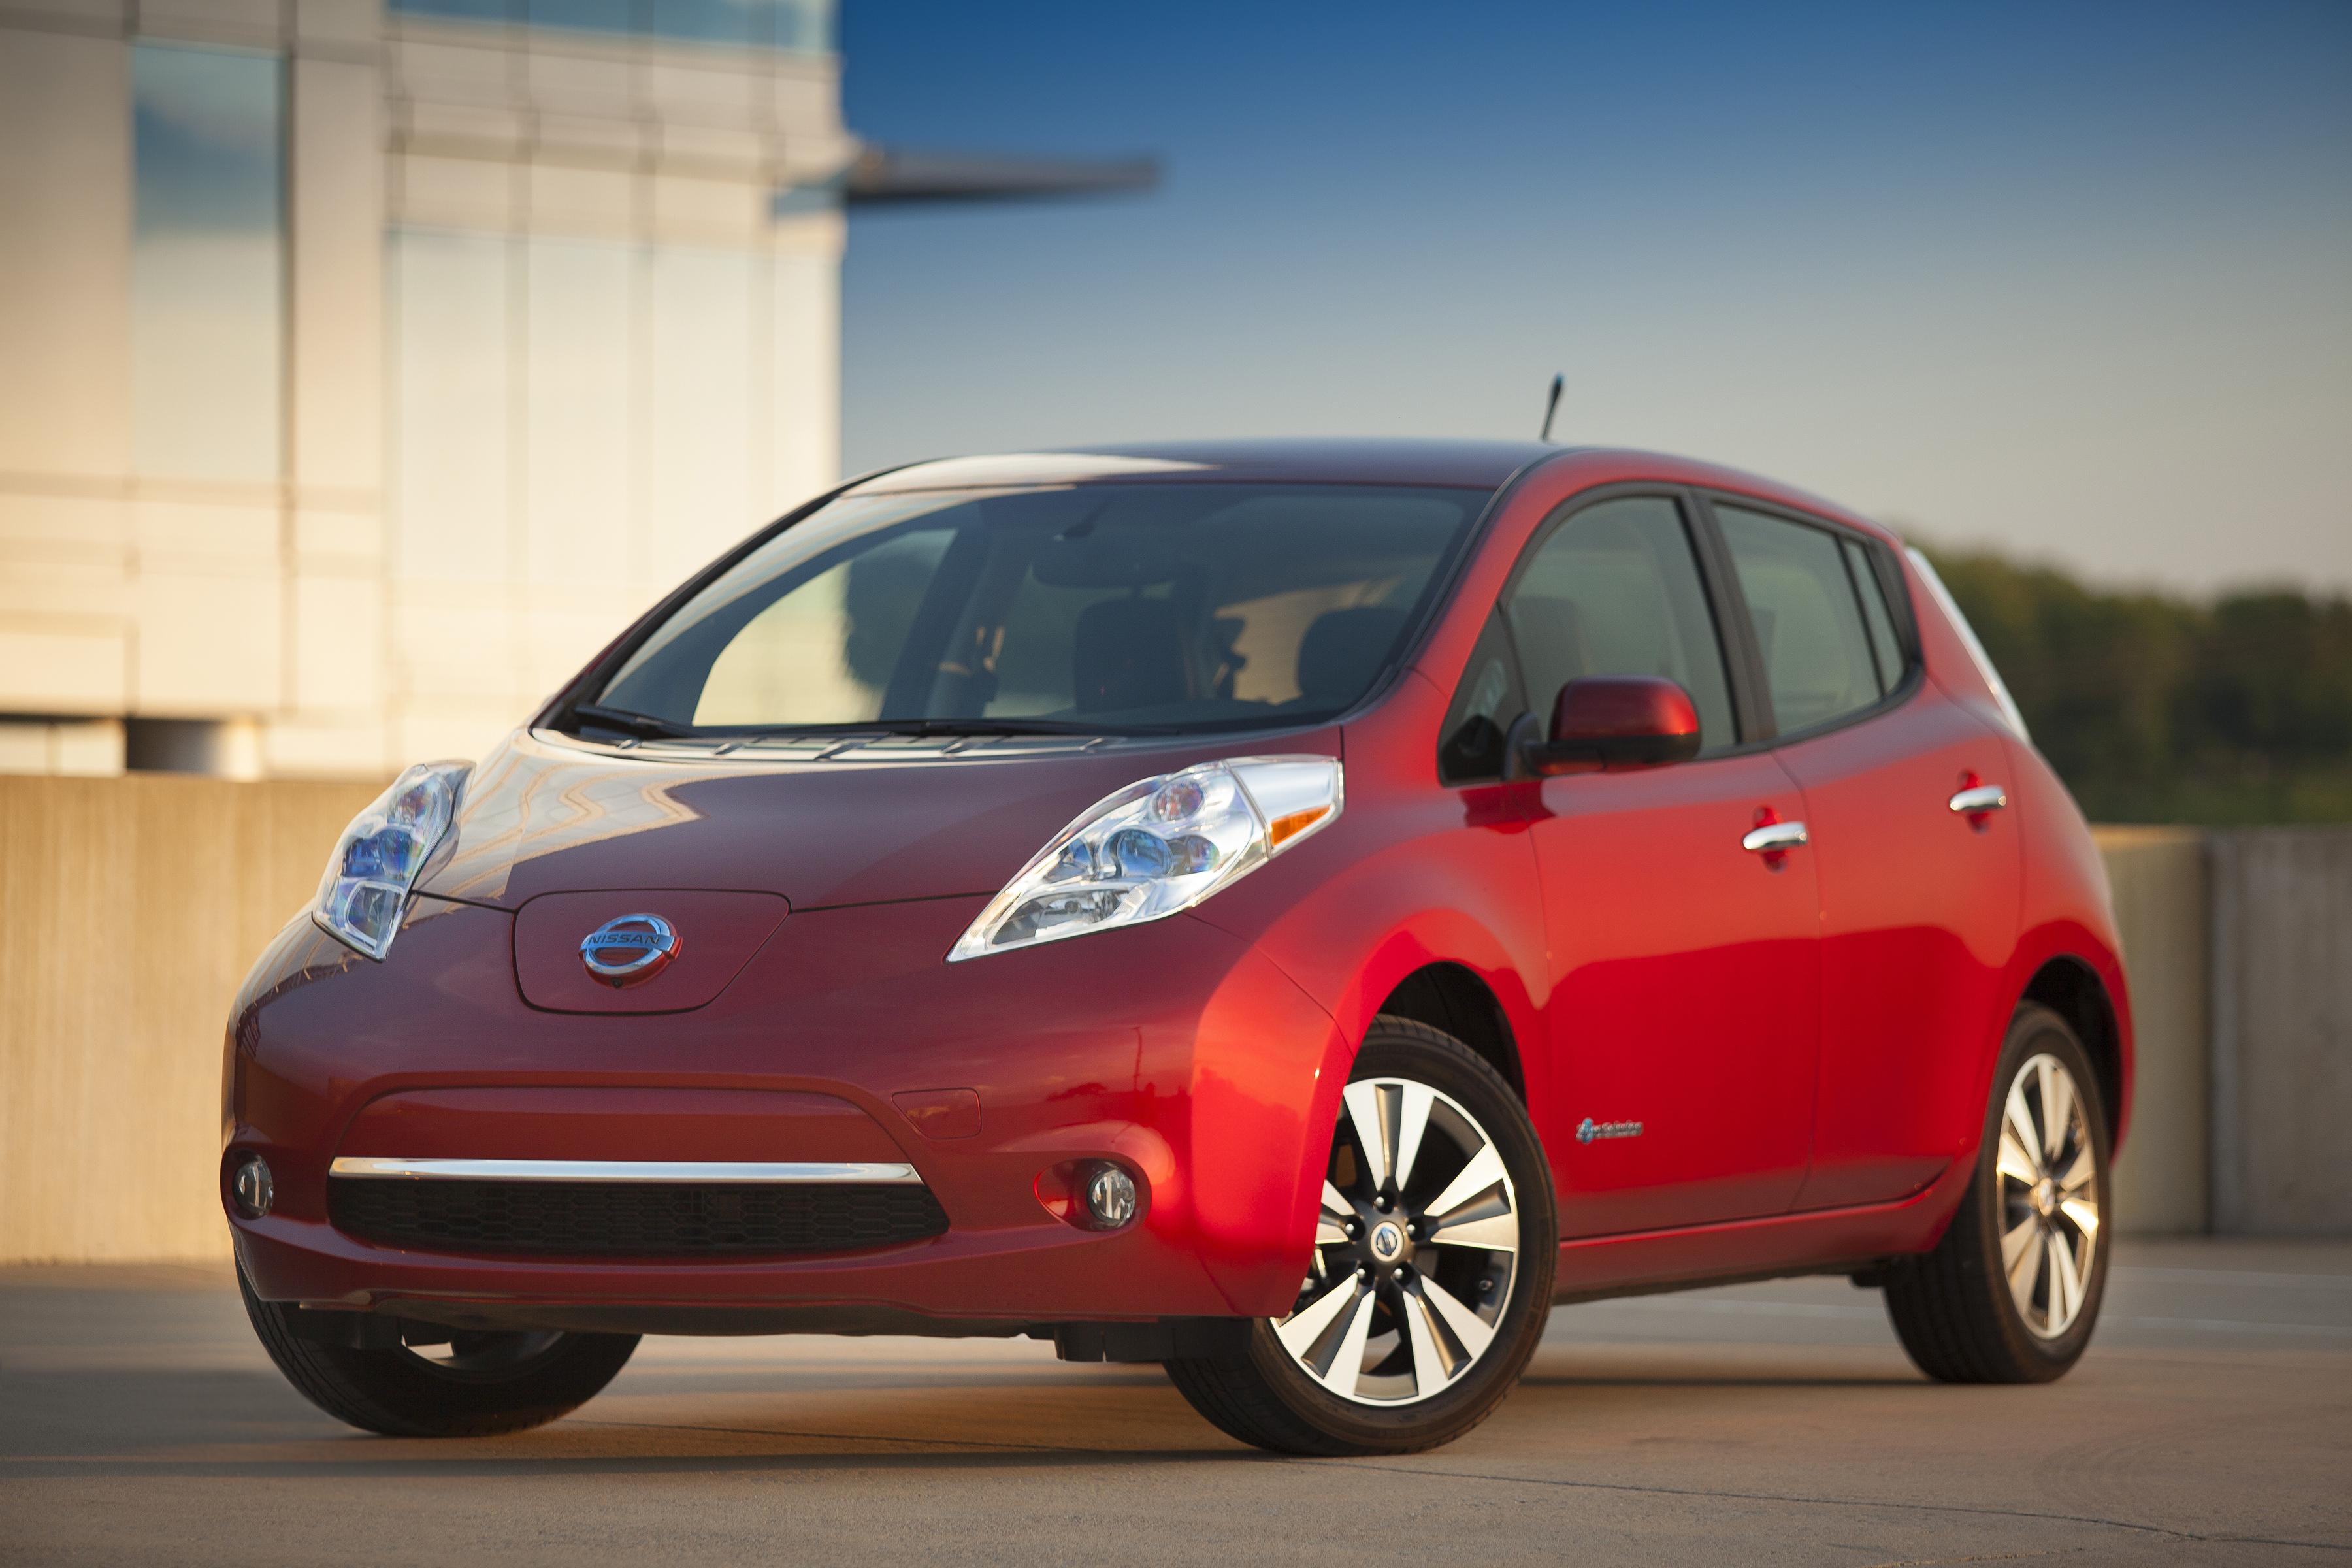 testing autonomous fleet in self urban undergoes nissan driving news car electric london leaf